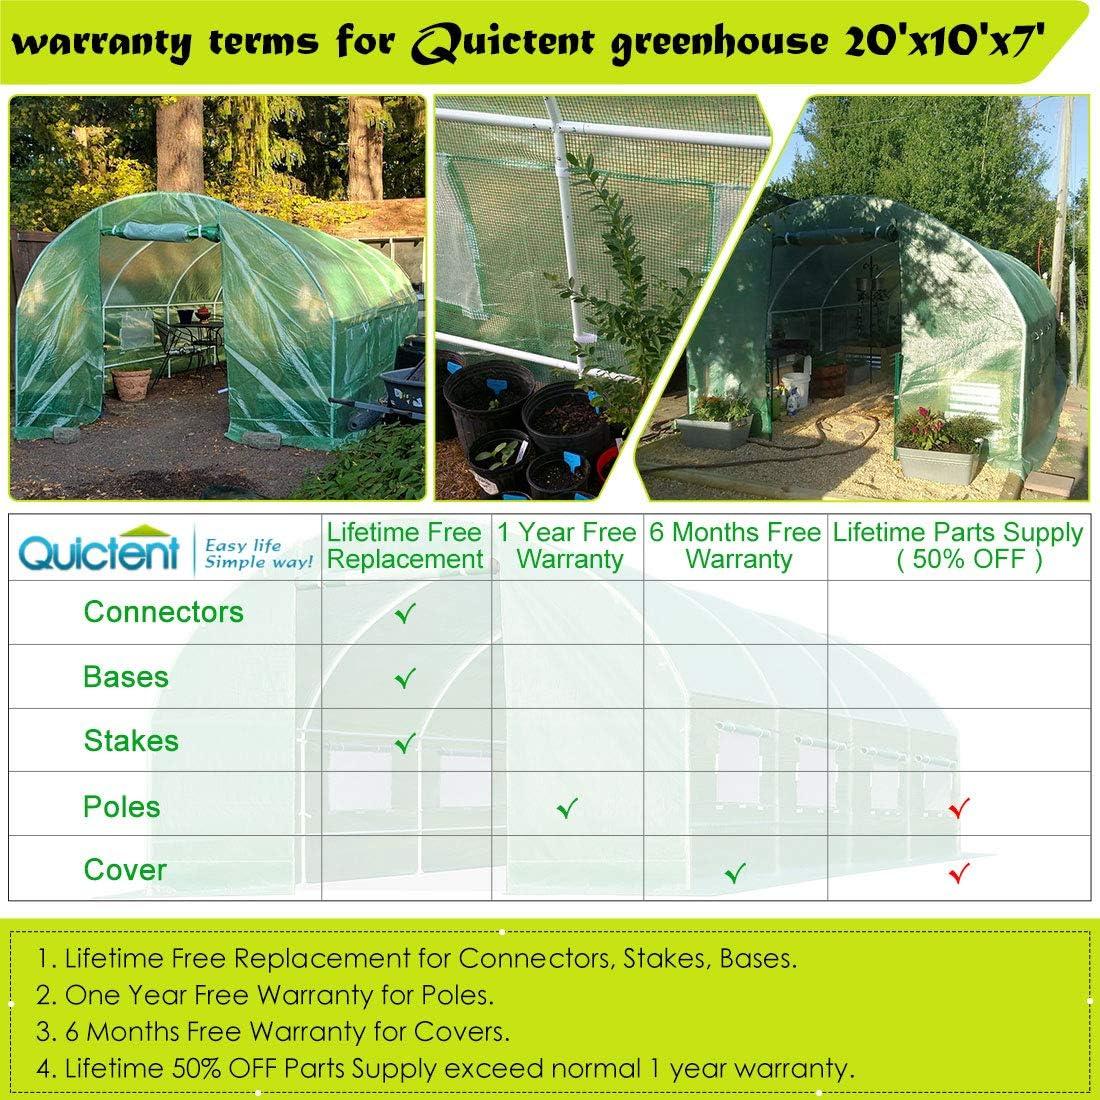 Quictent GM1306 Portable Greenhouse 20x10x6 Patio, Lawn & Garden ...